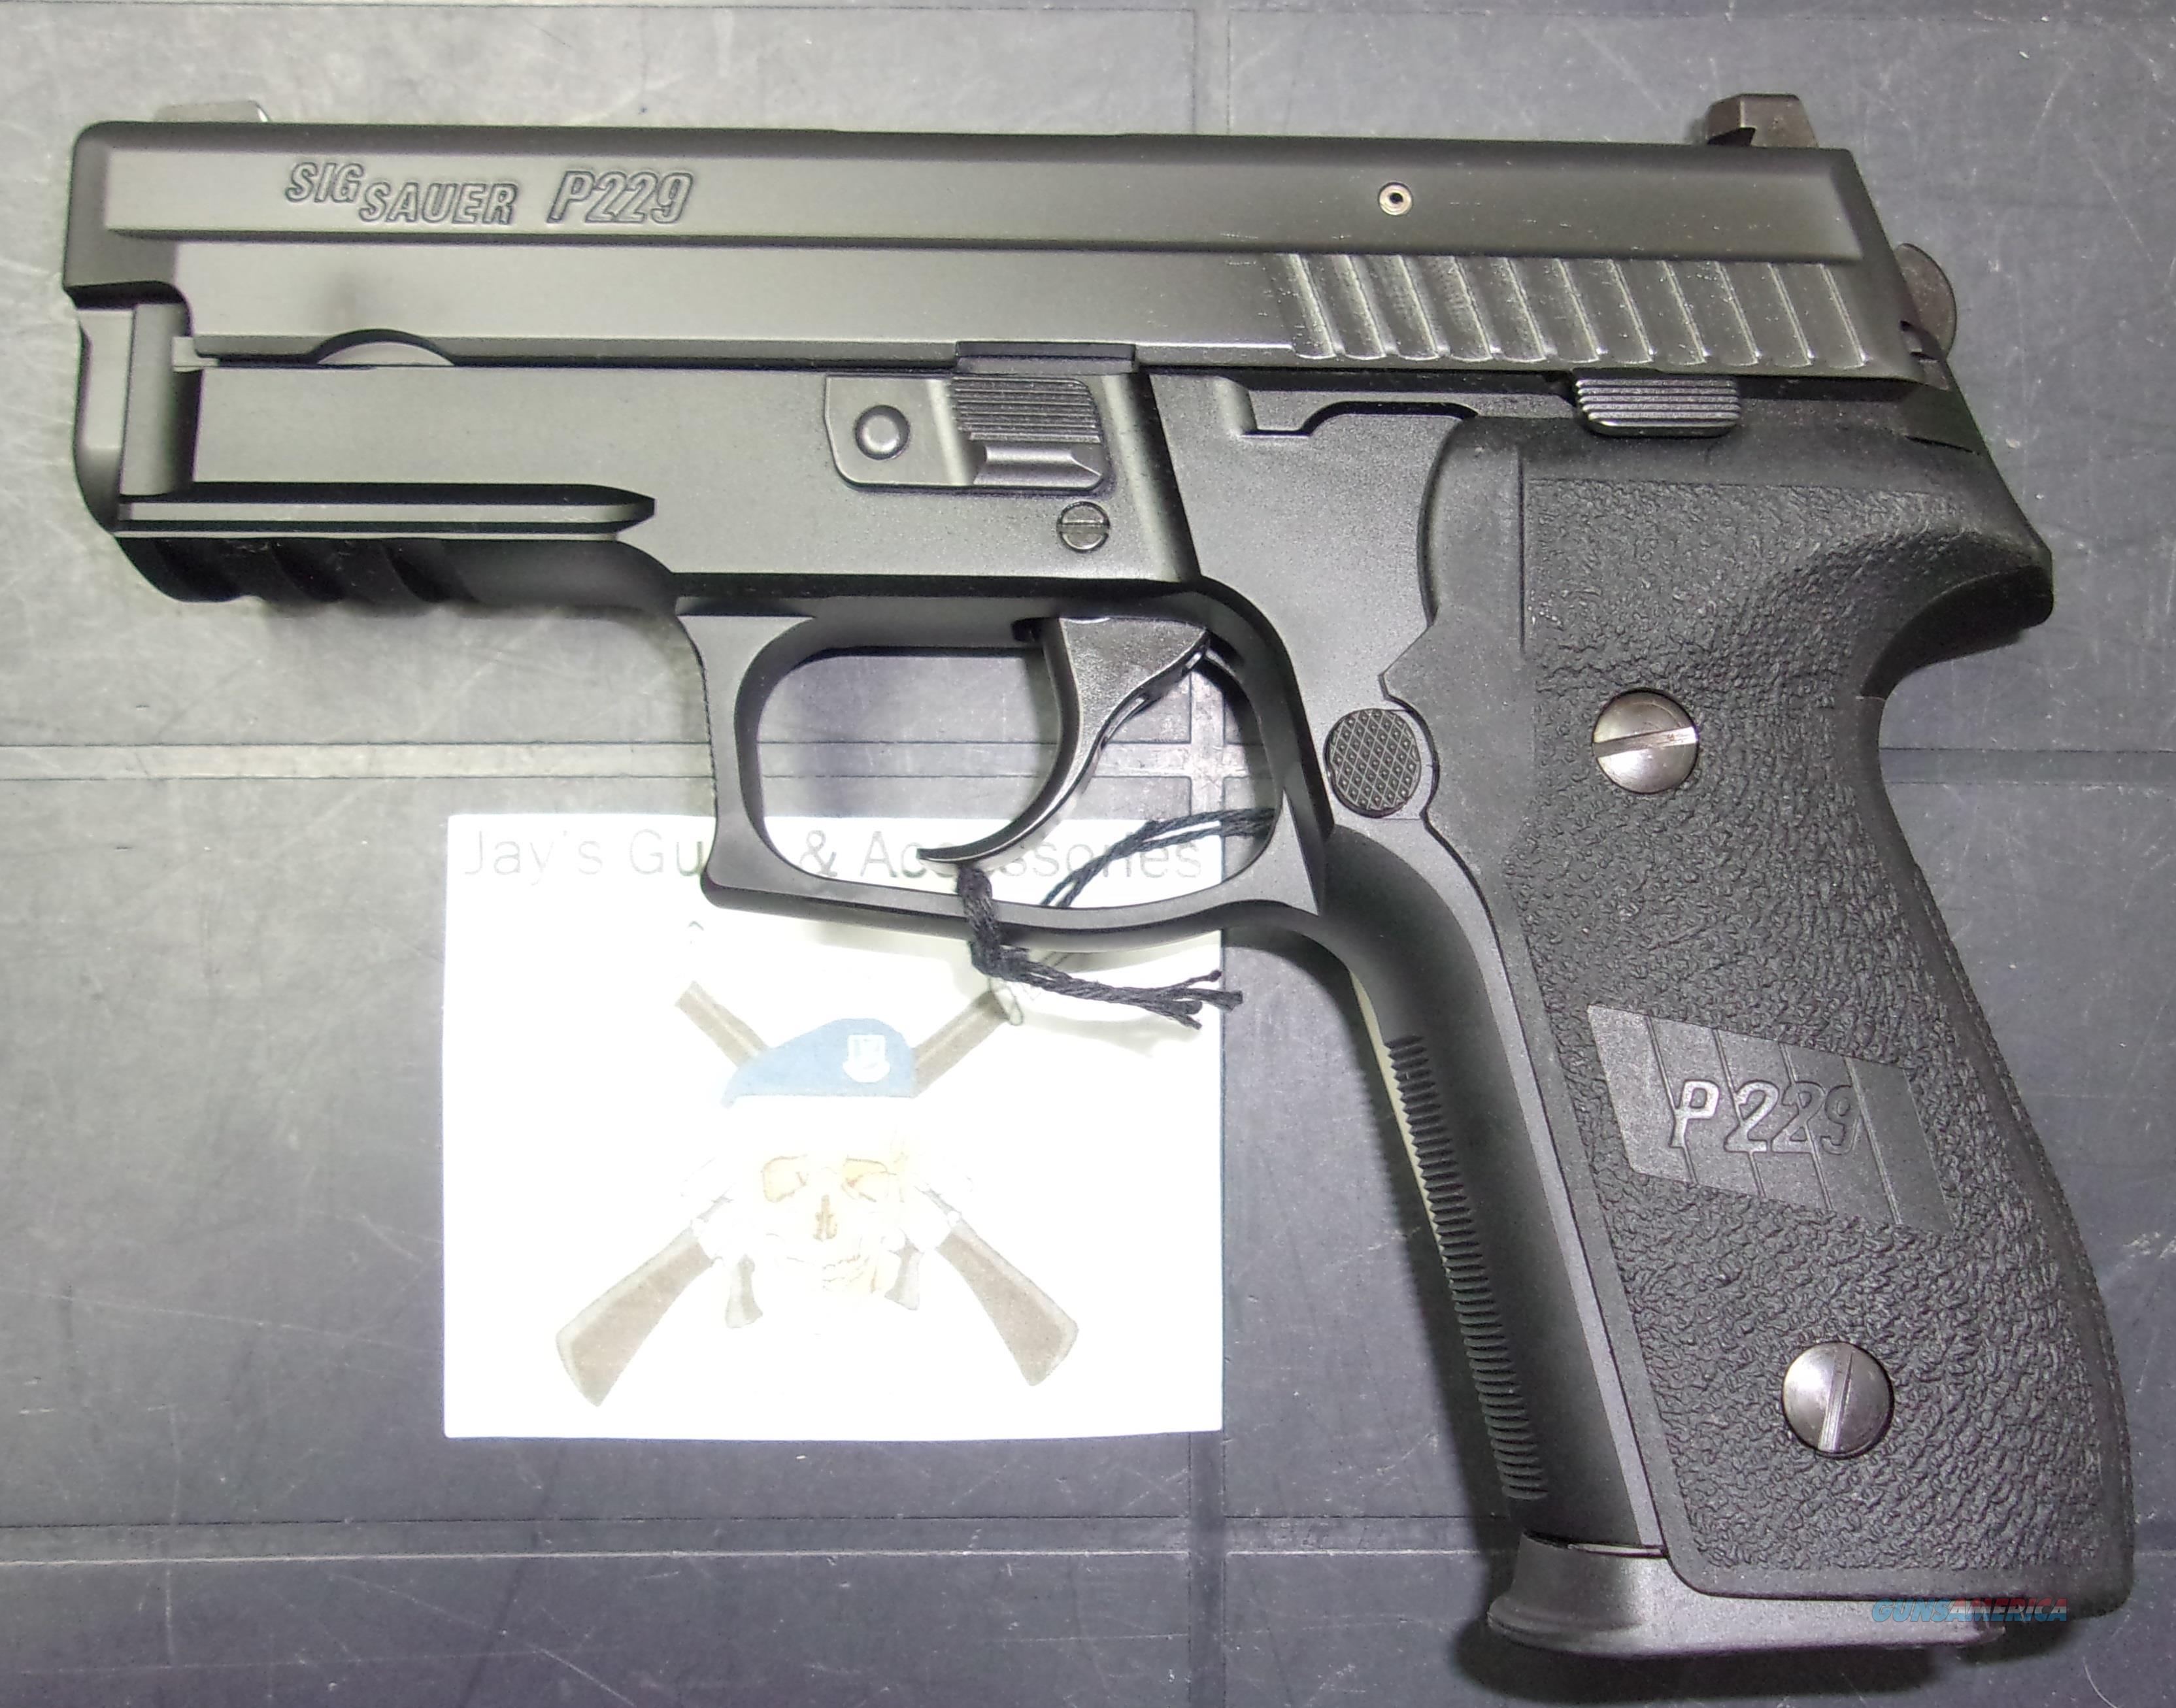 Sig Sauer P229 (UDE229-40-B1)  Guns > Pistols > Sig - Sauer/Sigarms Pistols > P229